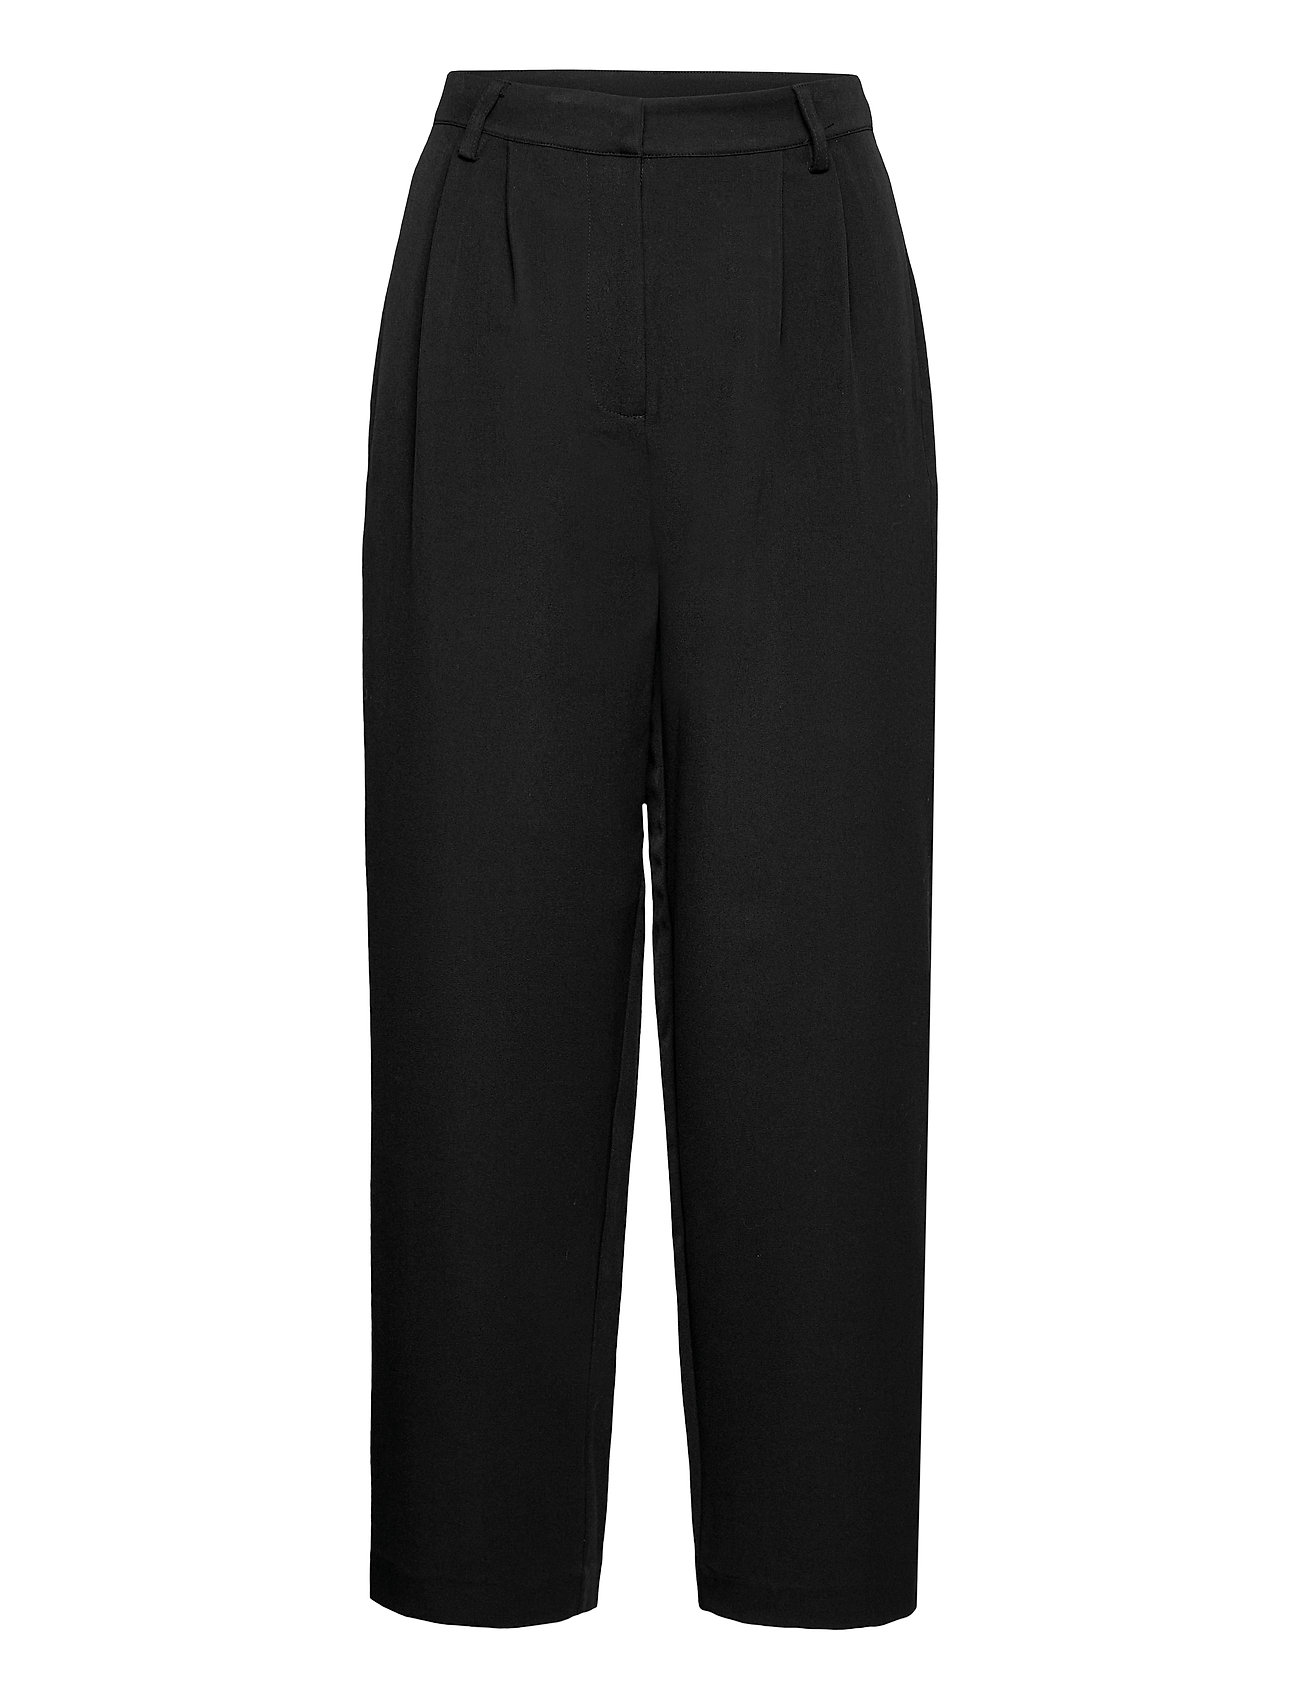 Yascornflower Hw Cropped Pant - Ca Vide Bukser Sort YAS